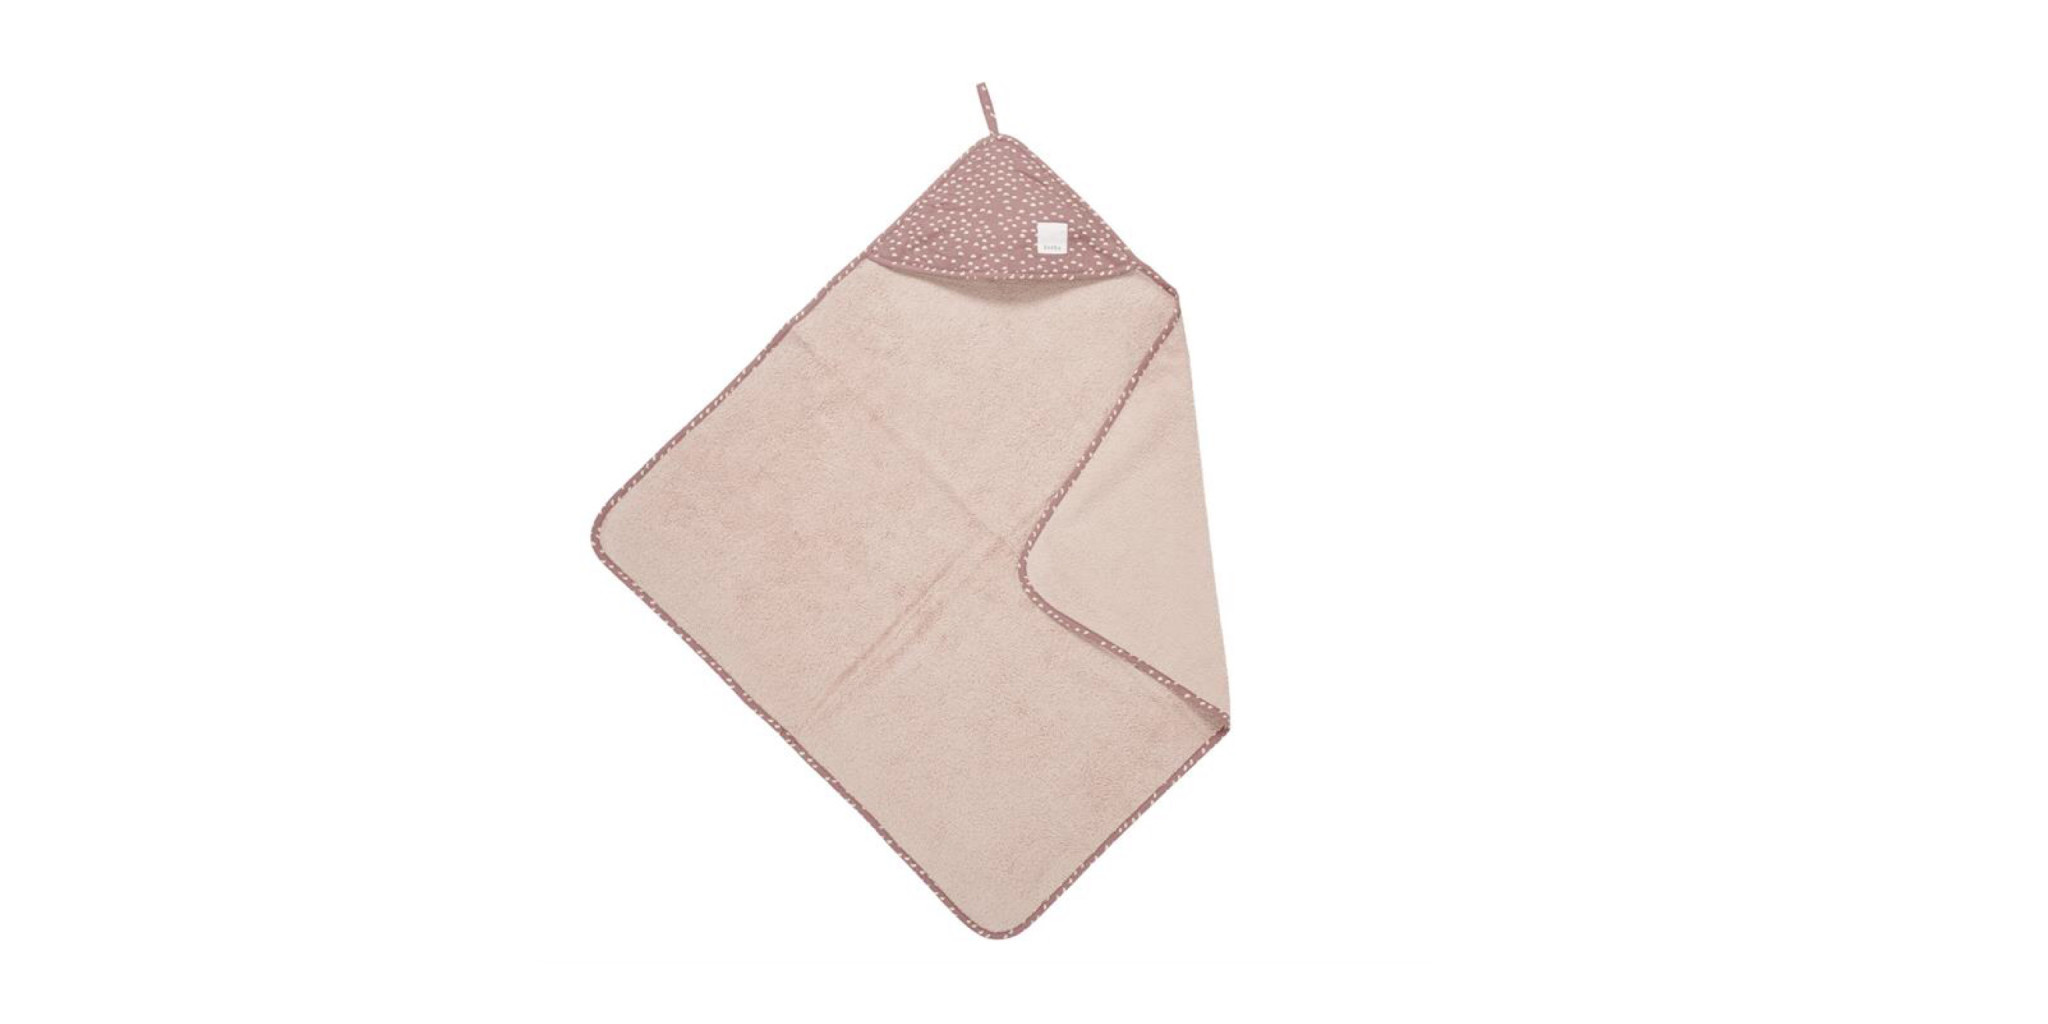 Koeka Koeka Malin Badcape Plum/Grey Pink 825/422